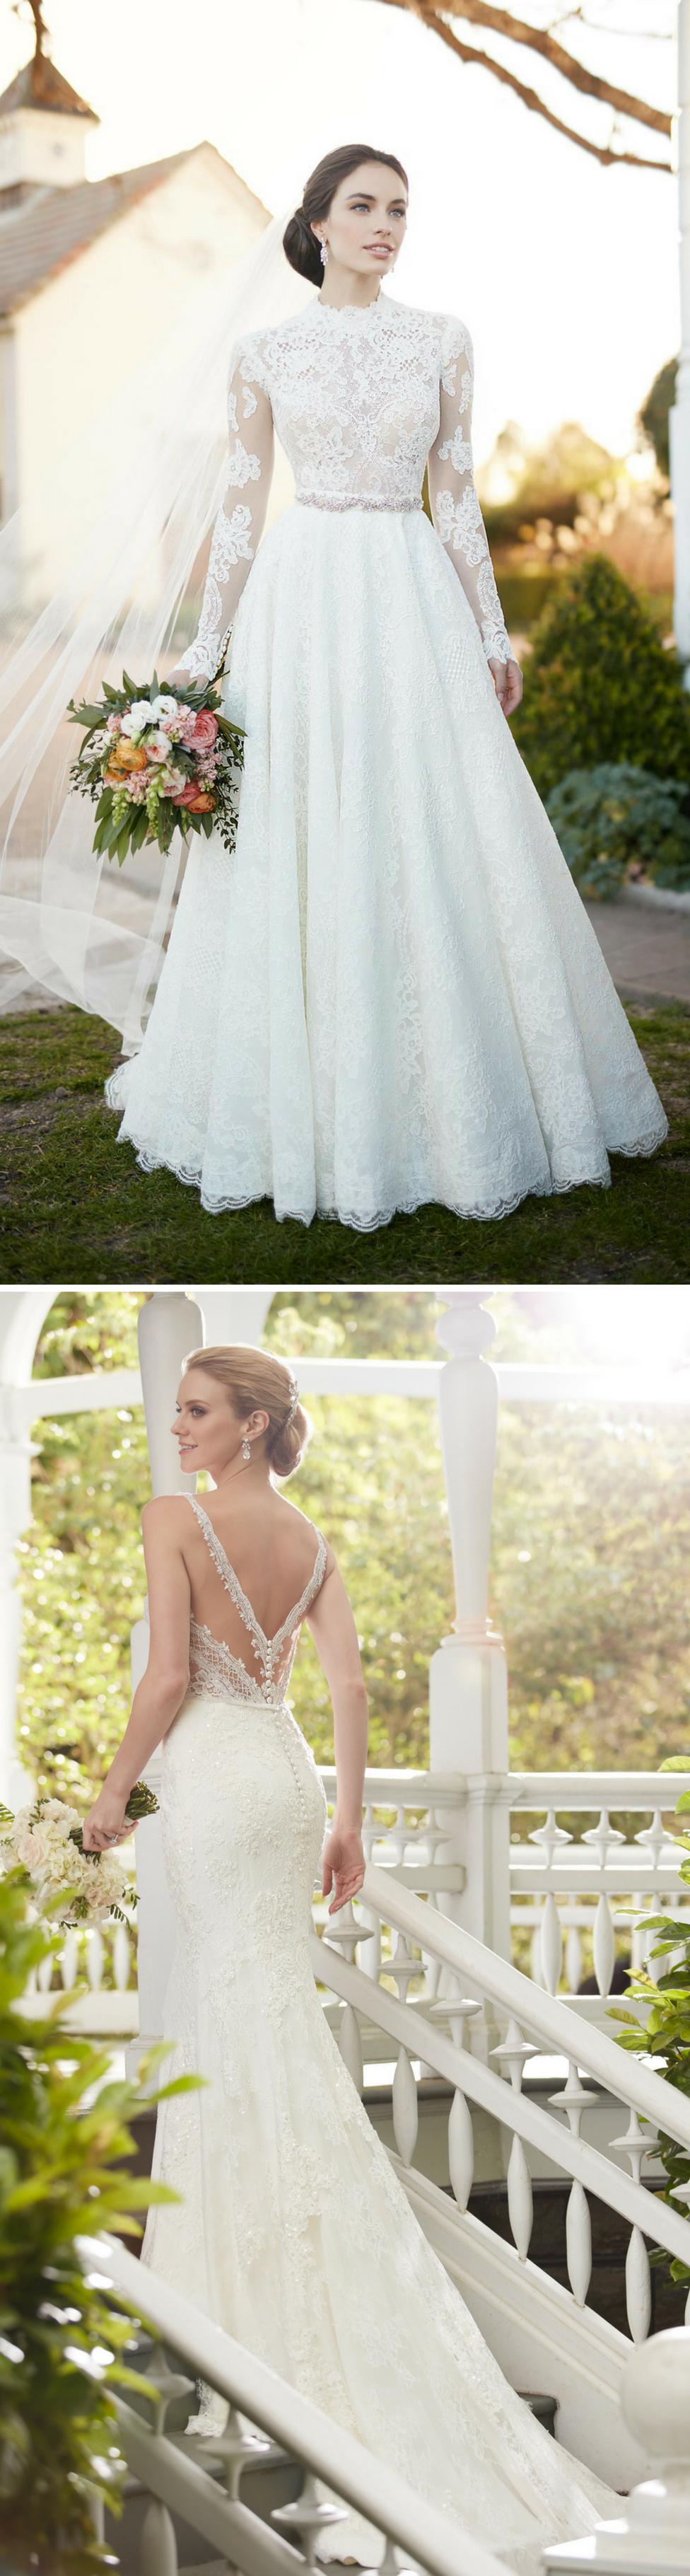 Vintage Wedding Dresses | Famous wedding dresses, Vintage weddings ...